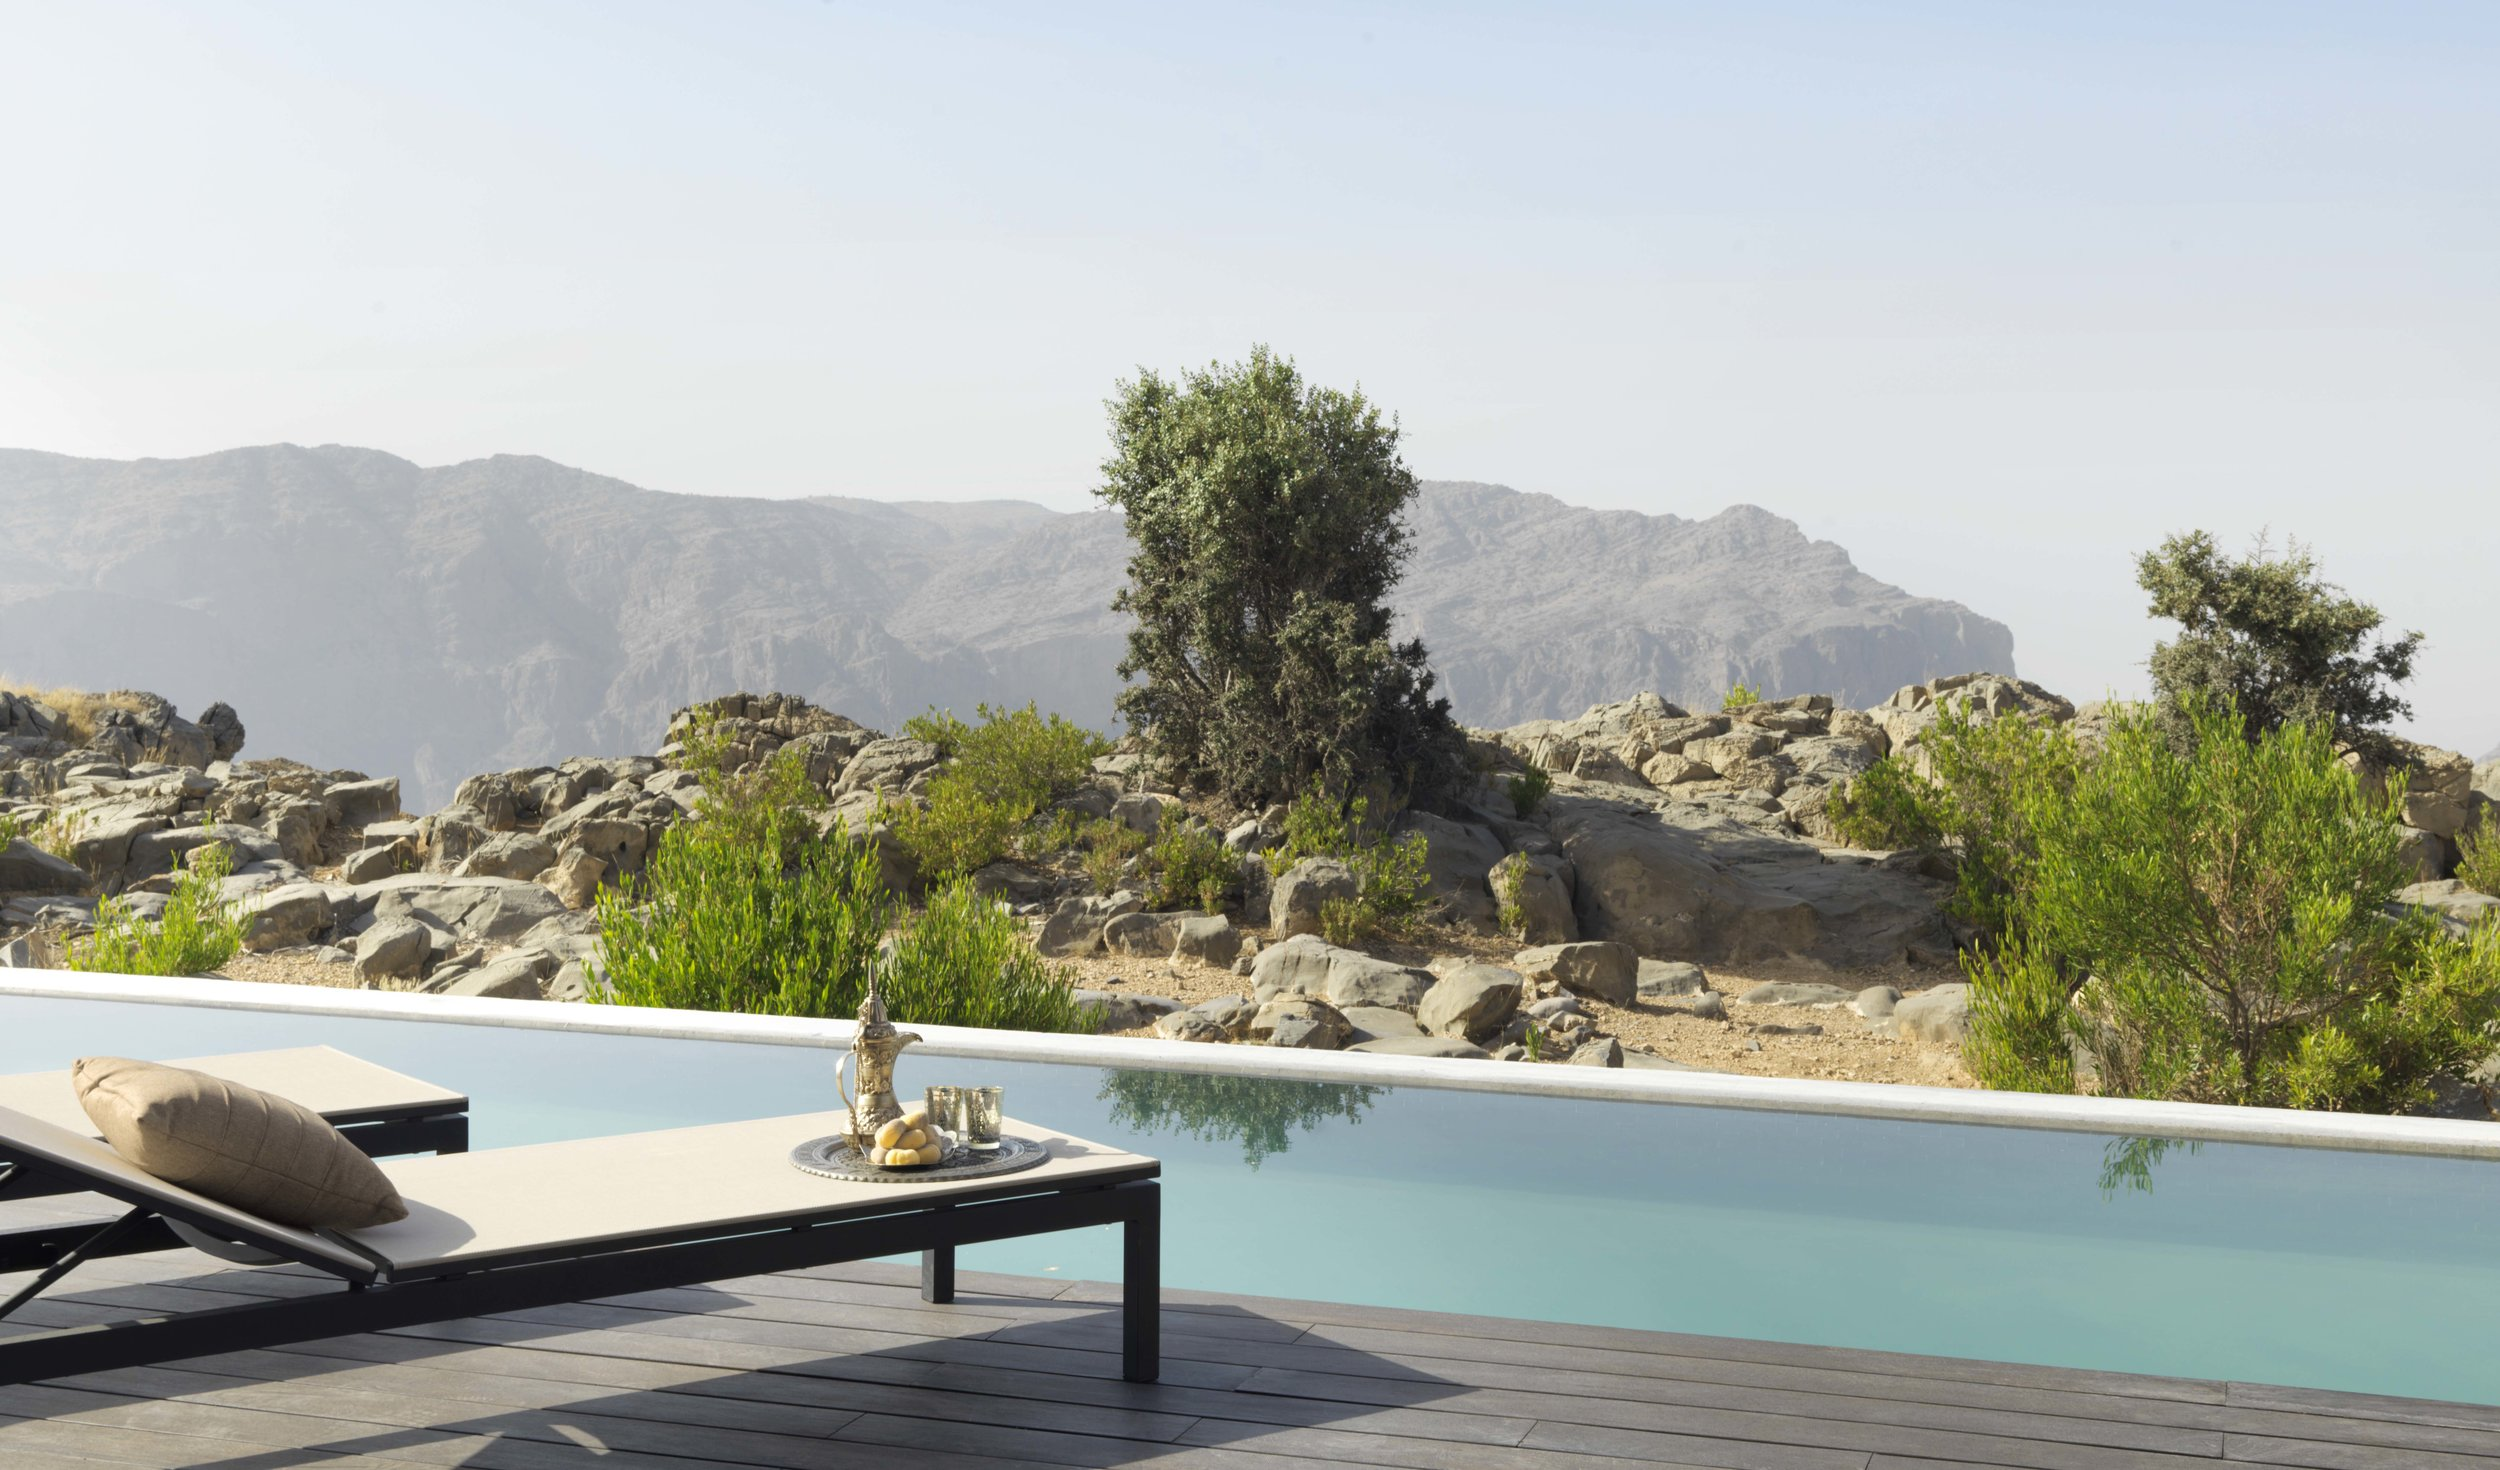 Anantara Al Jabal Al Akhdar Resort - Cliff Pool Villa Pool View 02 (2).jpg